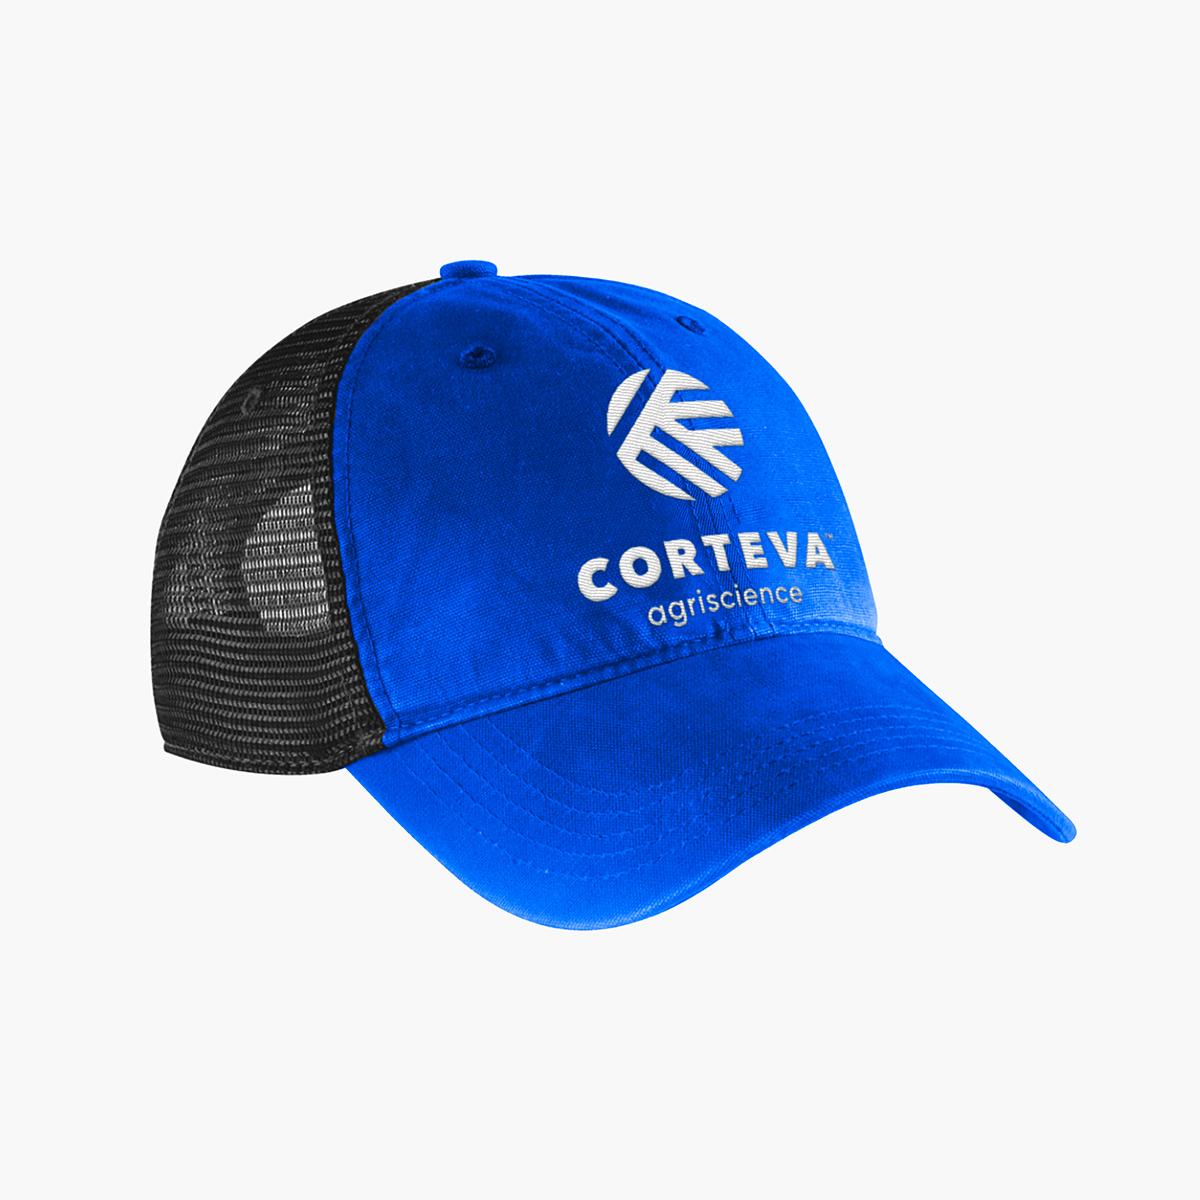 CortevaCapSq.jpg